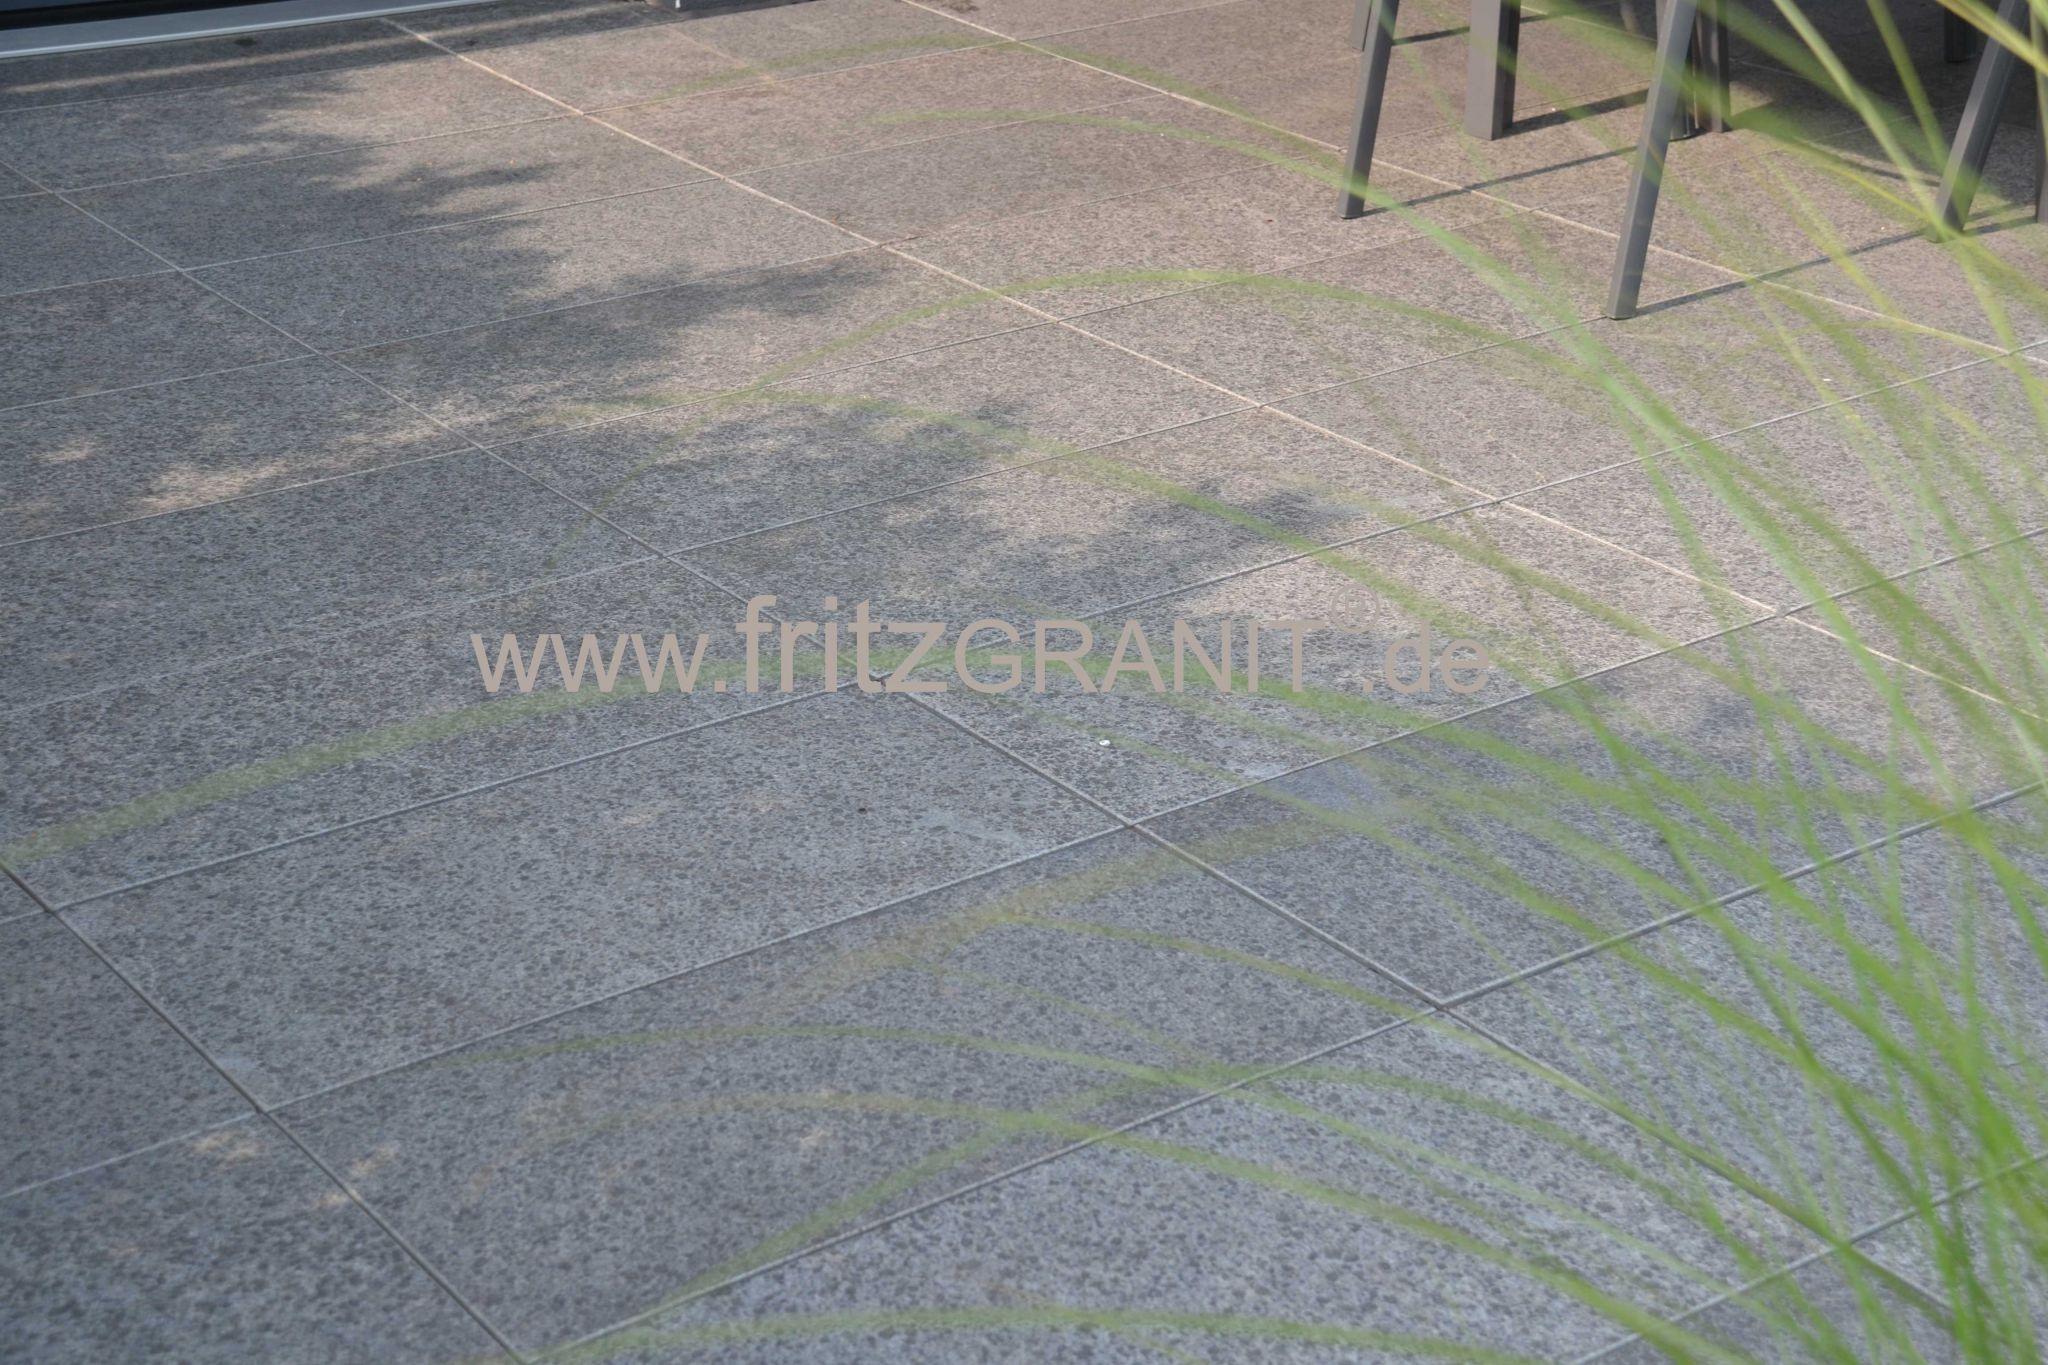 Asphalt Fußbodenplatten ~ Fugenschneiden in beton und asphalt kernbohrung